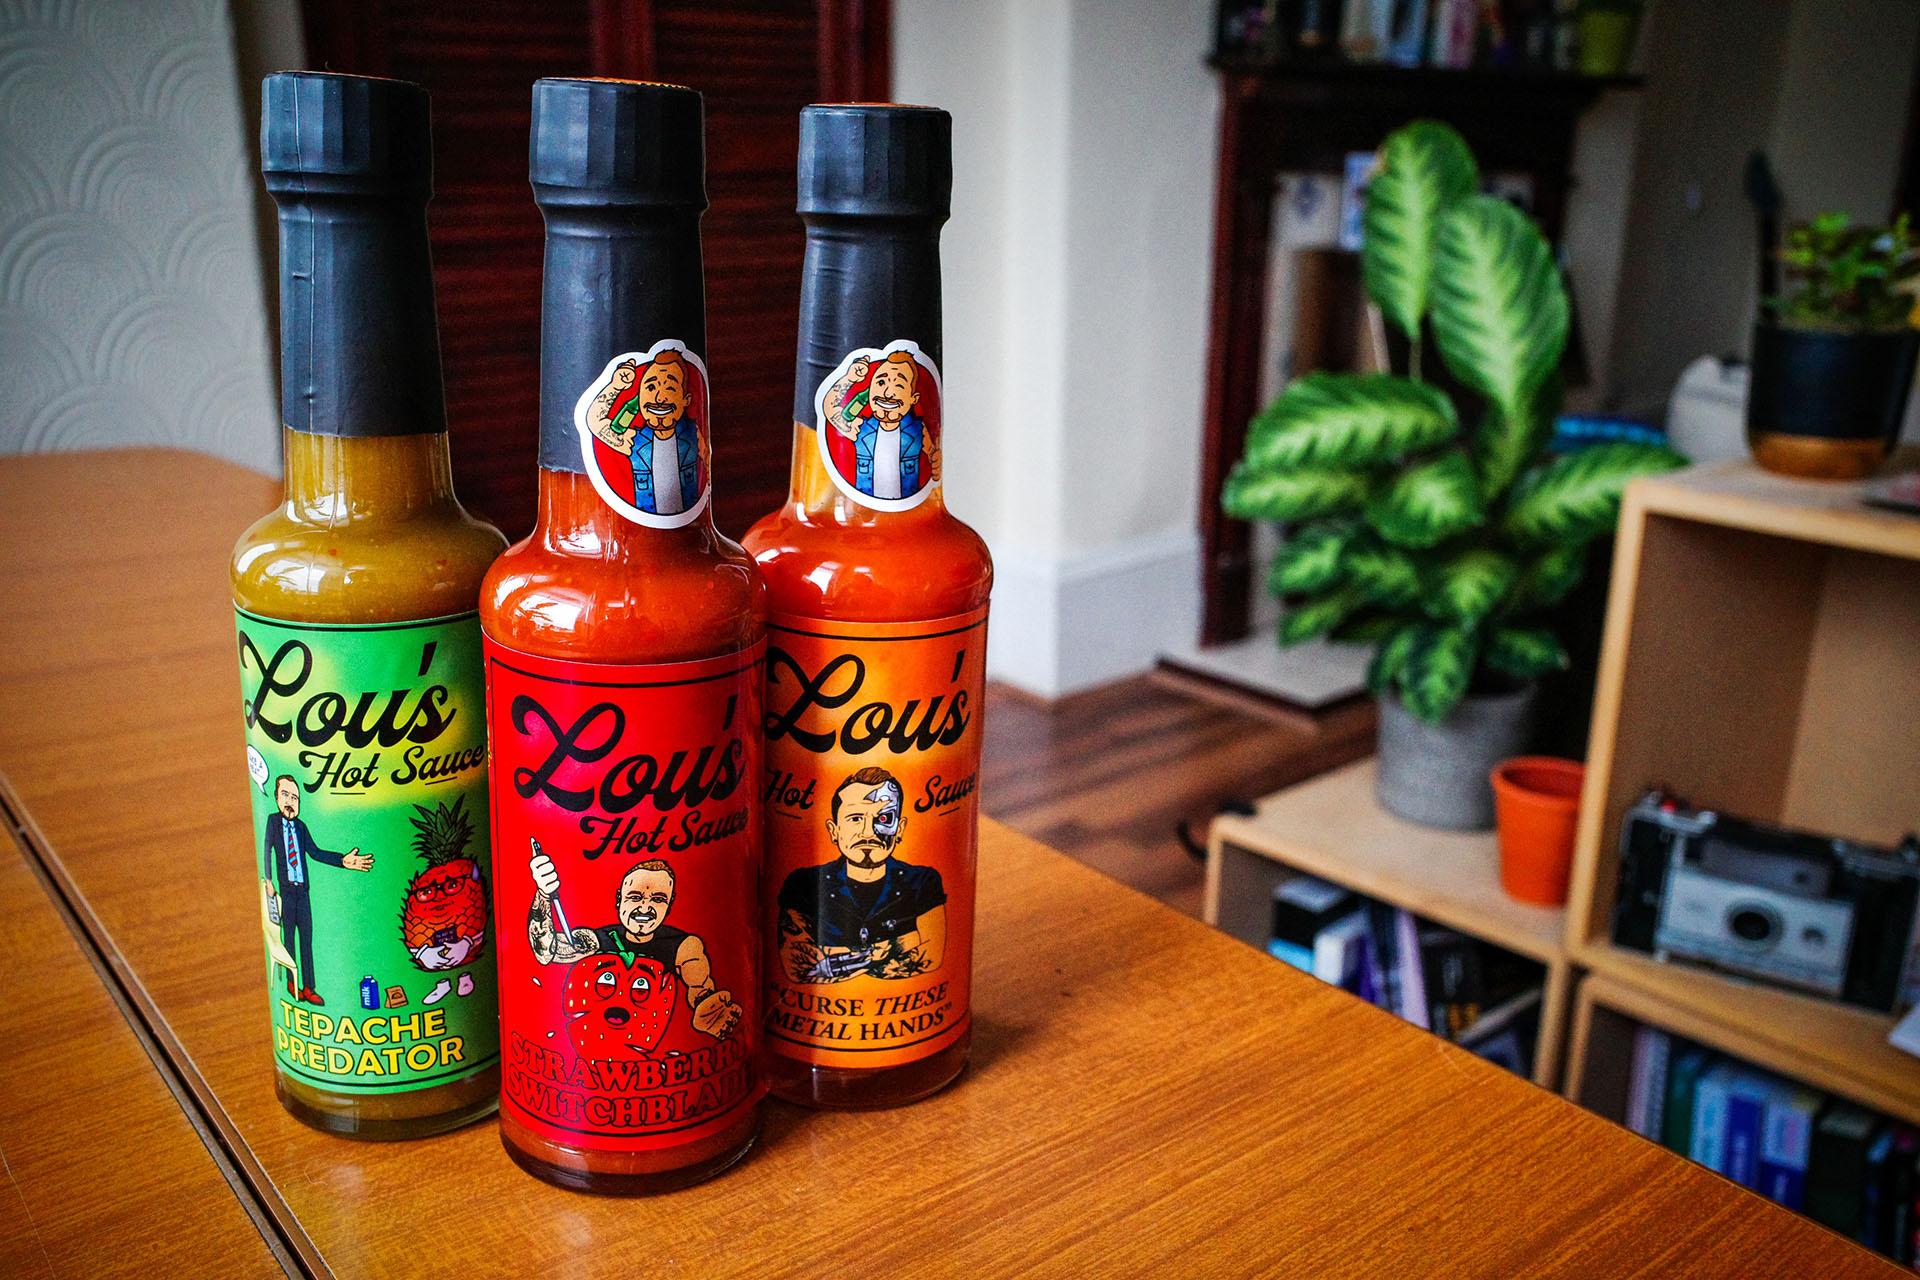 Lou's Hot sauce bottles